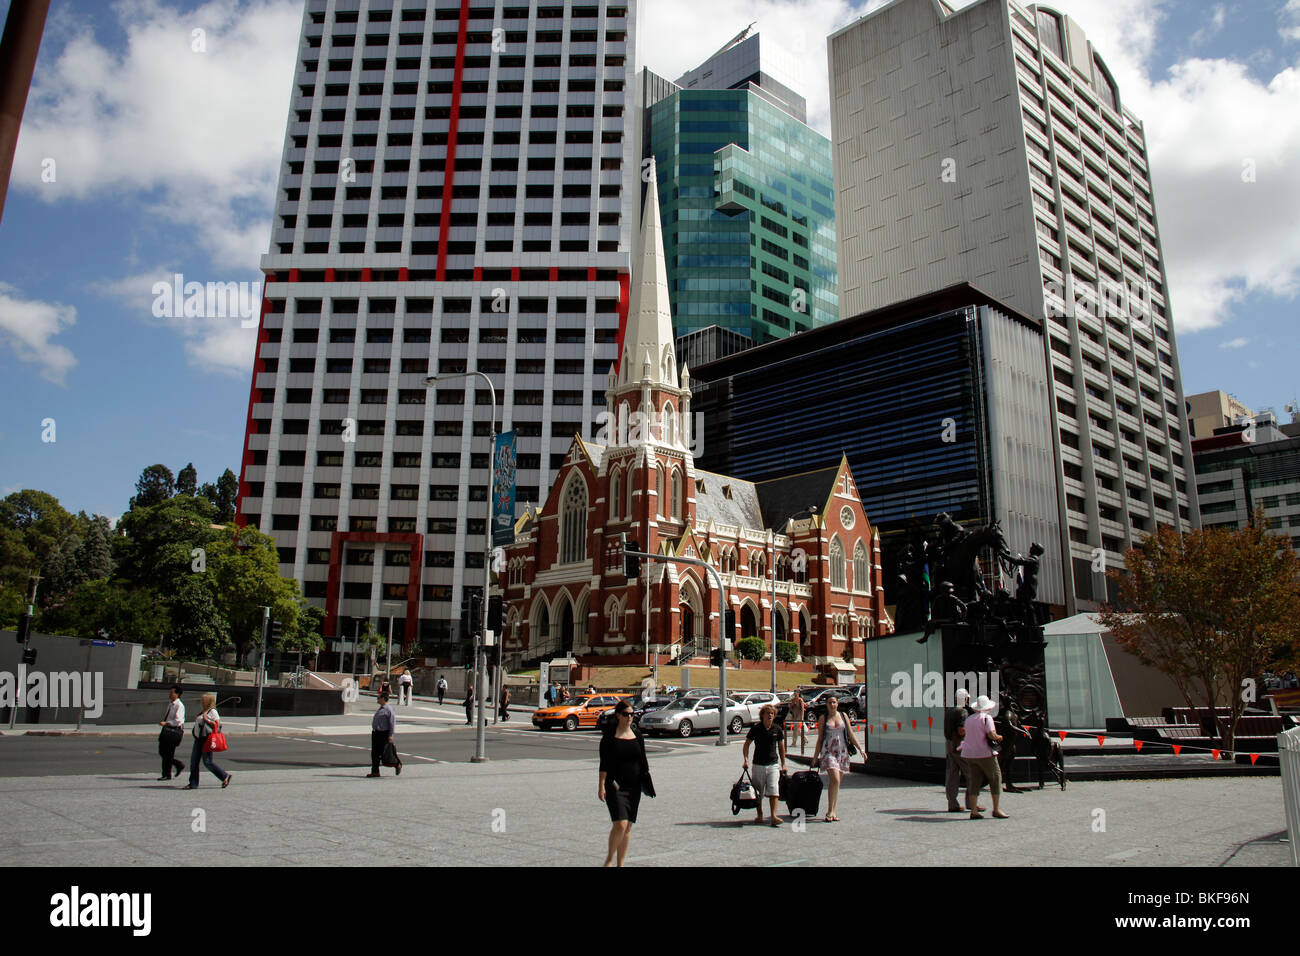 King George Square and Albert Street Uniting Church in Brisbane, Queensland, Australia - Stock Image